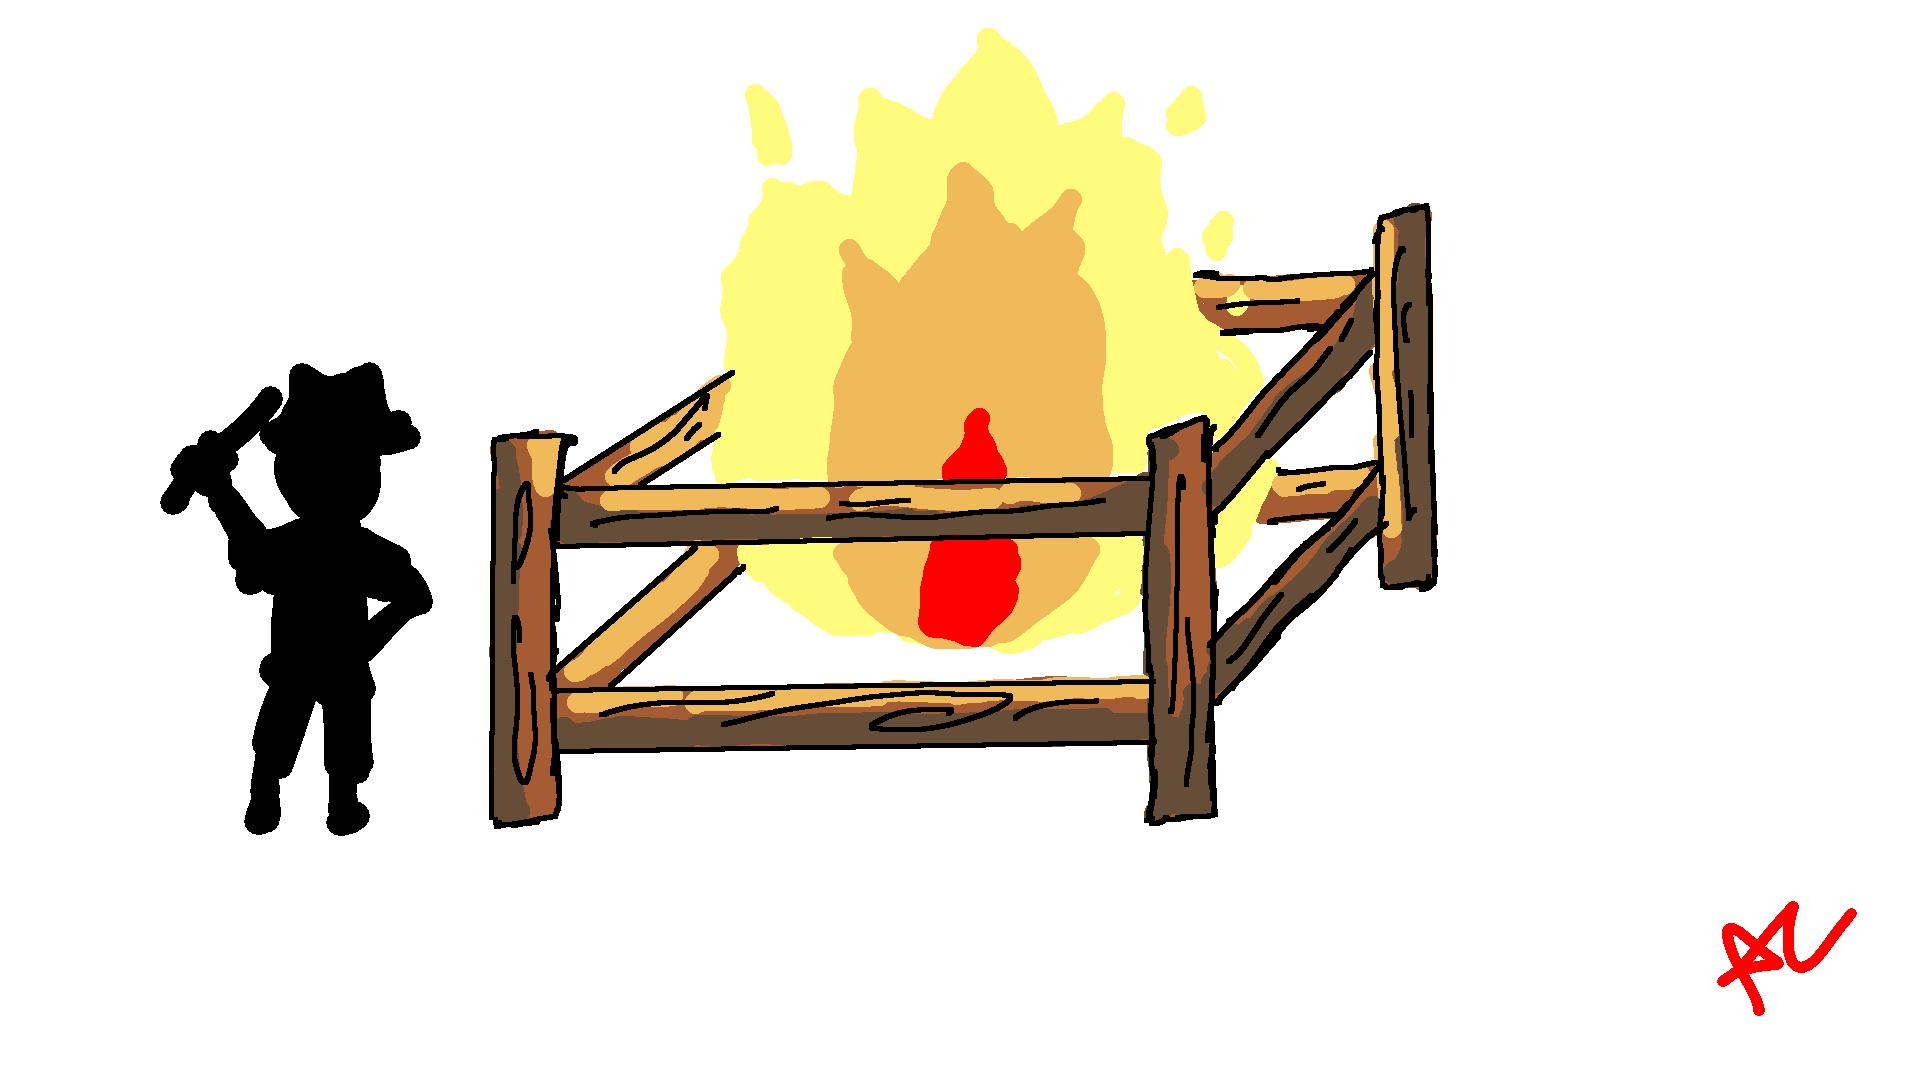 009_TownBonfire.png